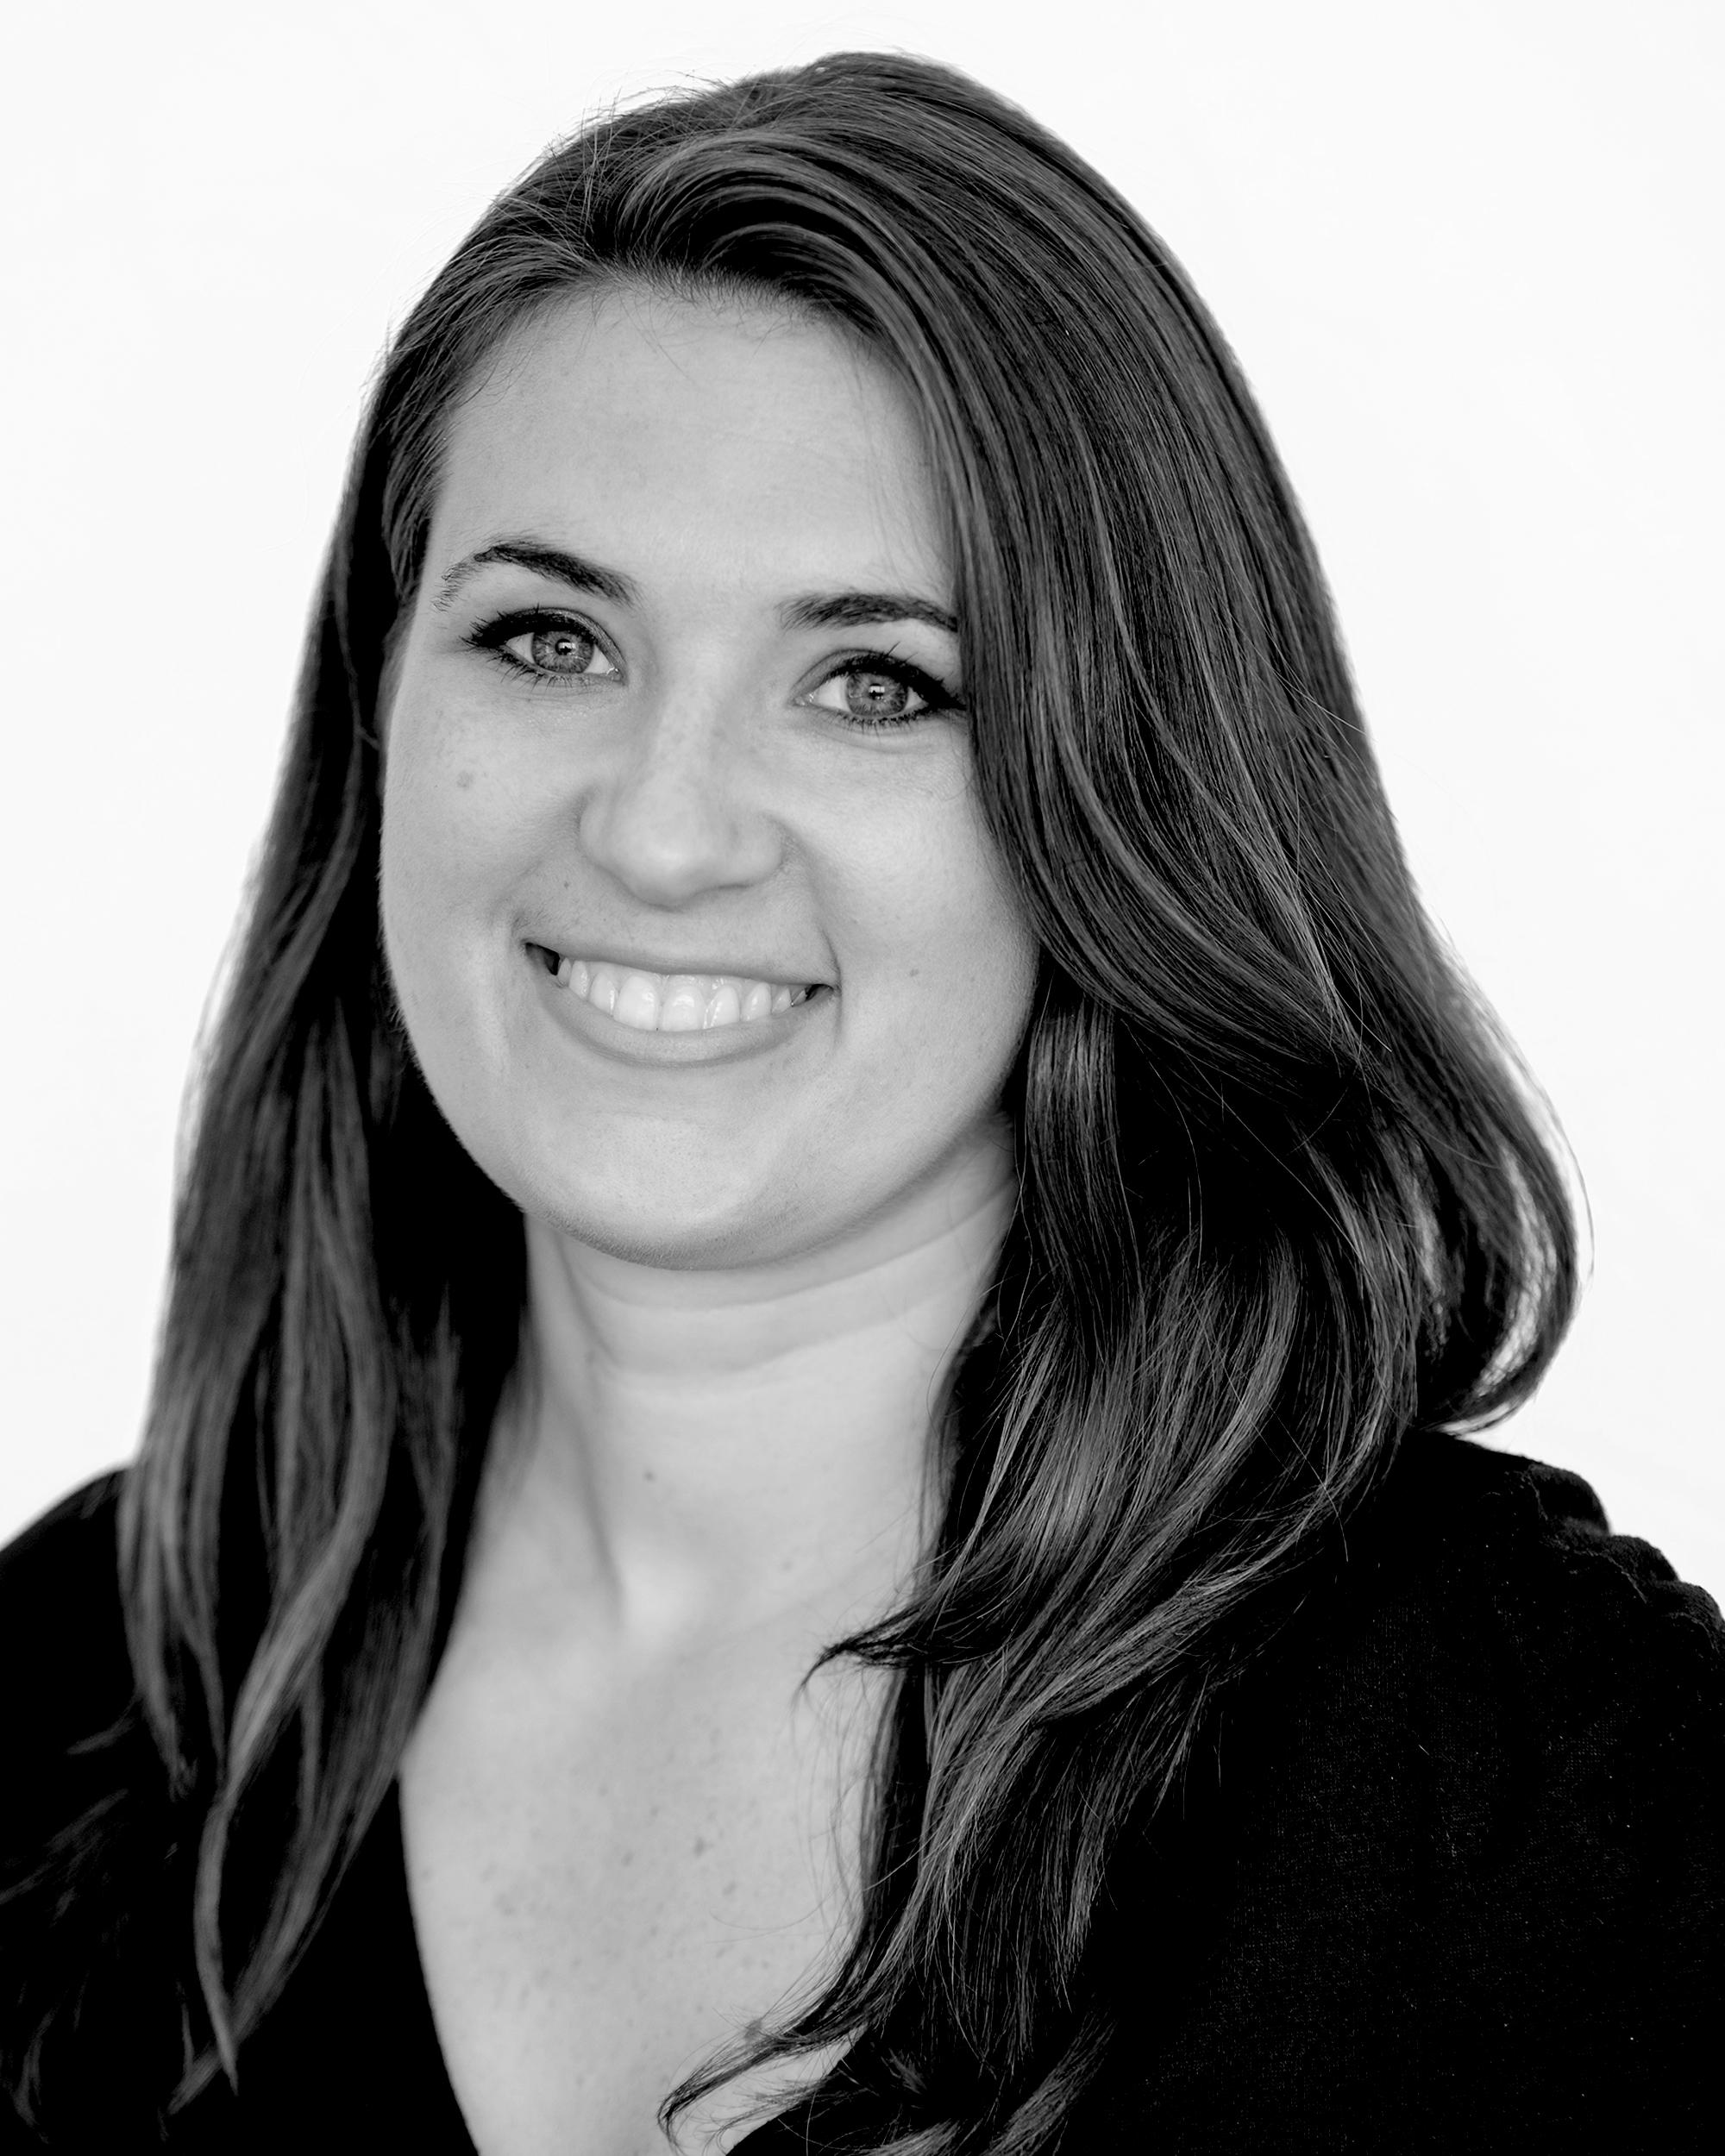 Headshot of Sarah-Lynn Schnare